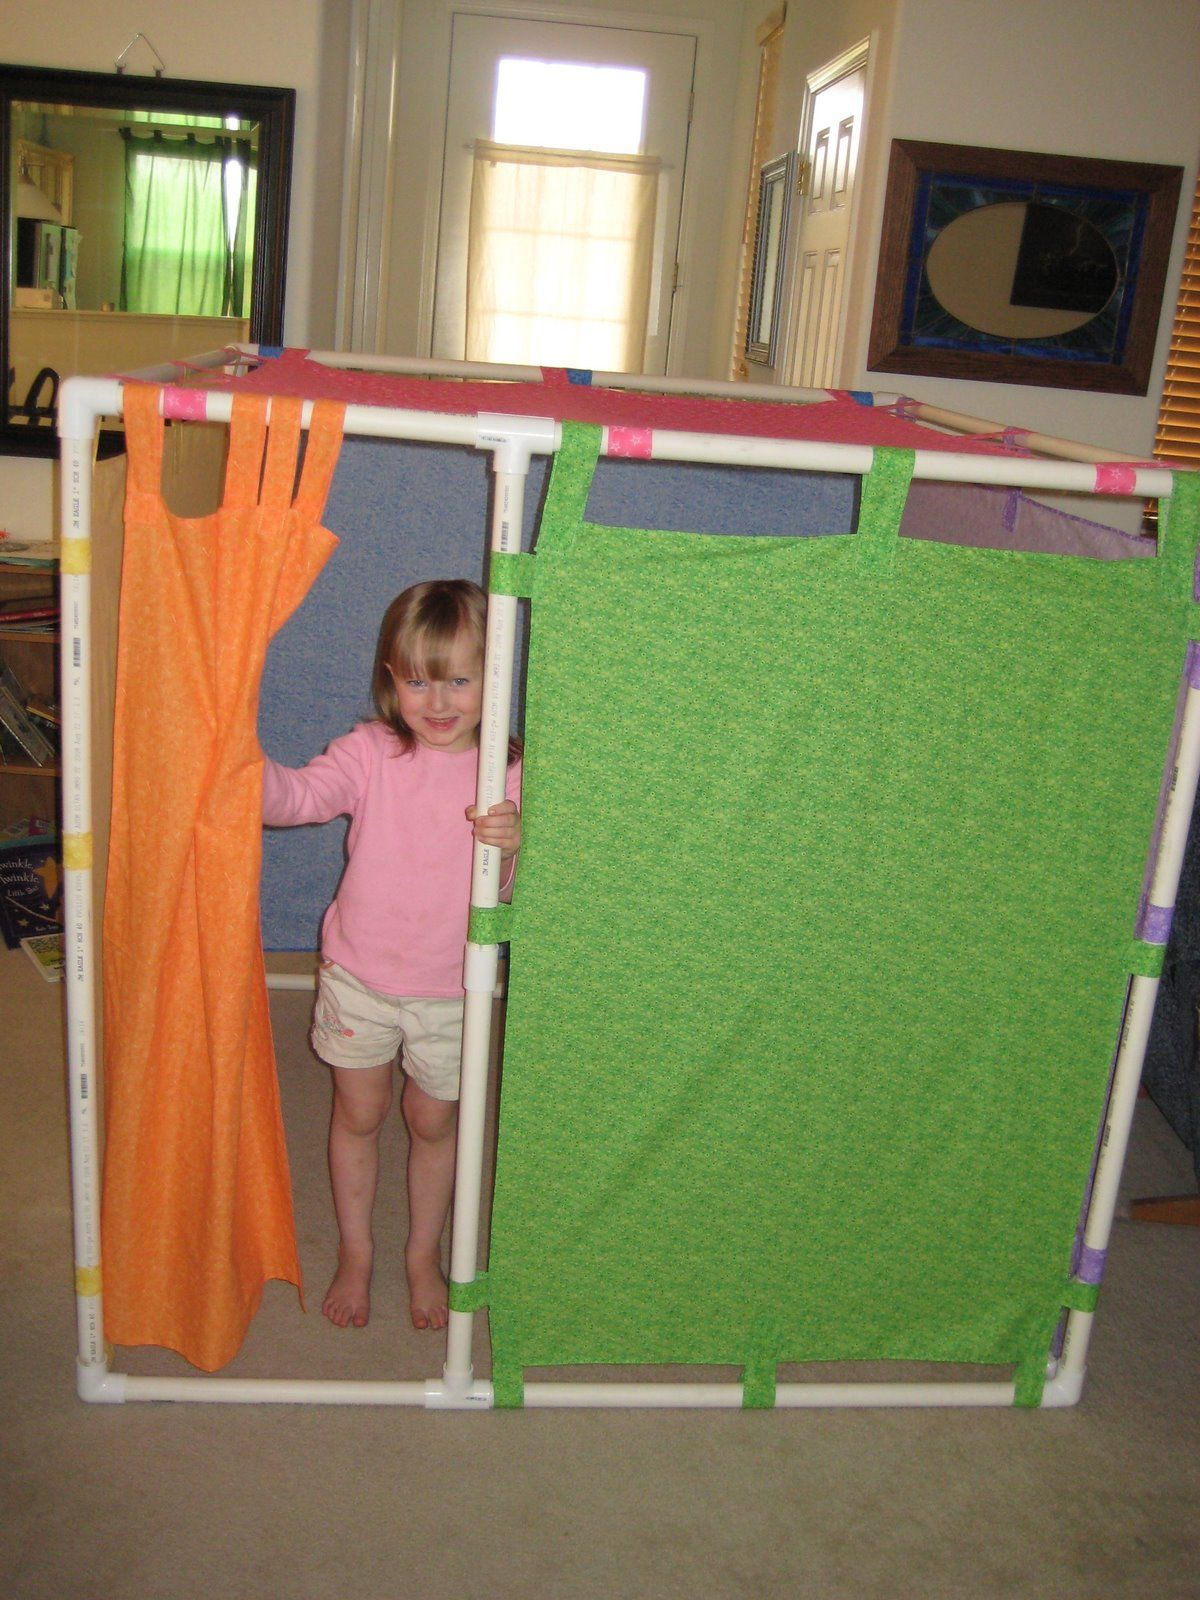 spielhaus aus pe rohren kinderzimmer ideen. Black Bedroom Furniture Sets. Home Design Ideas